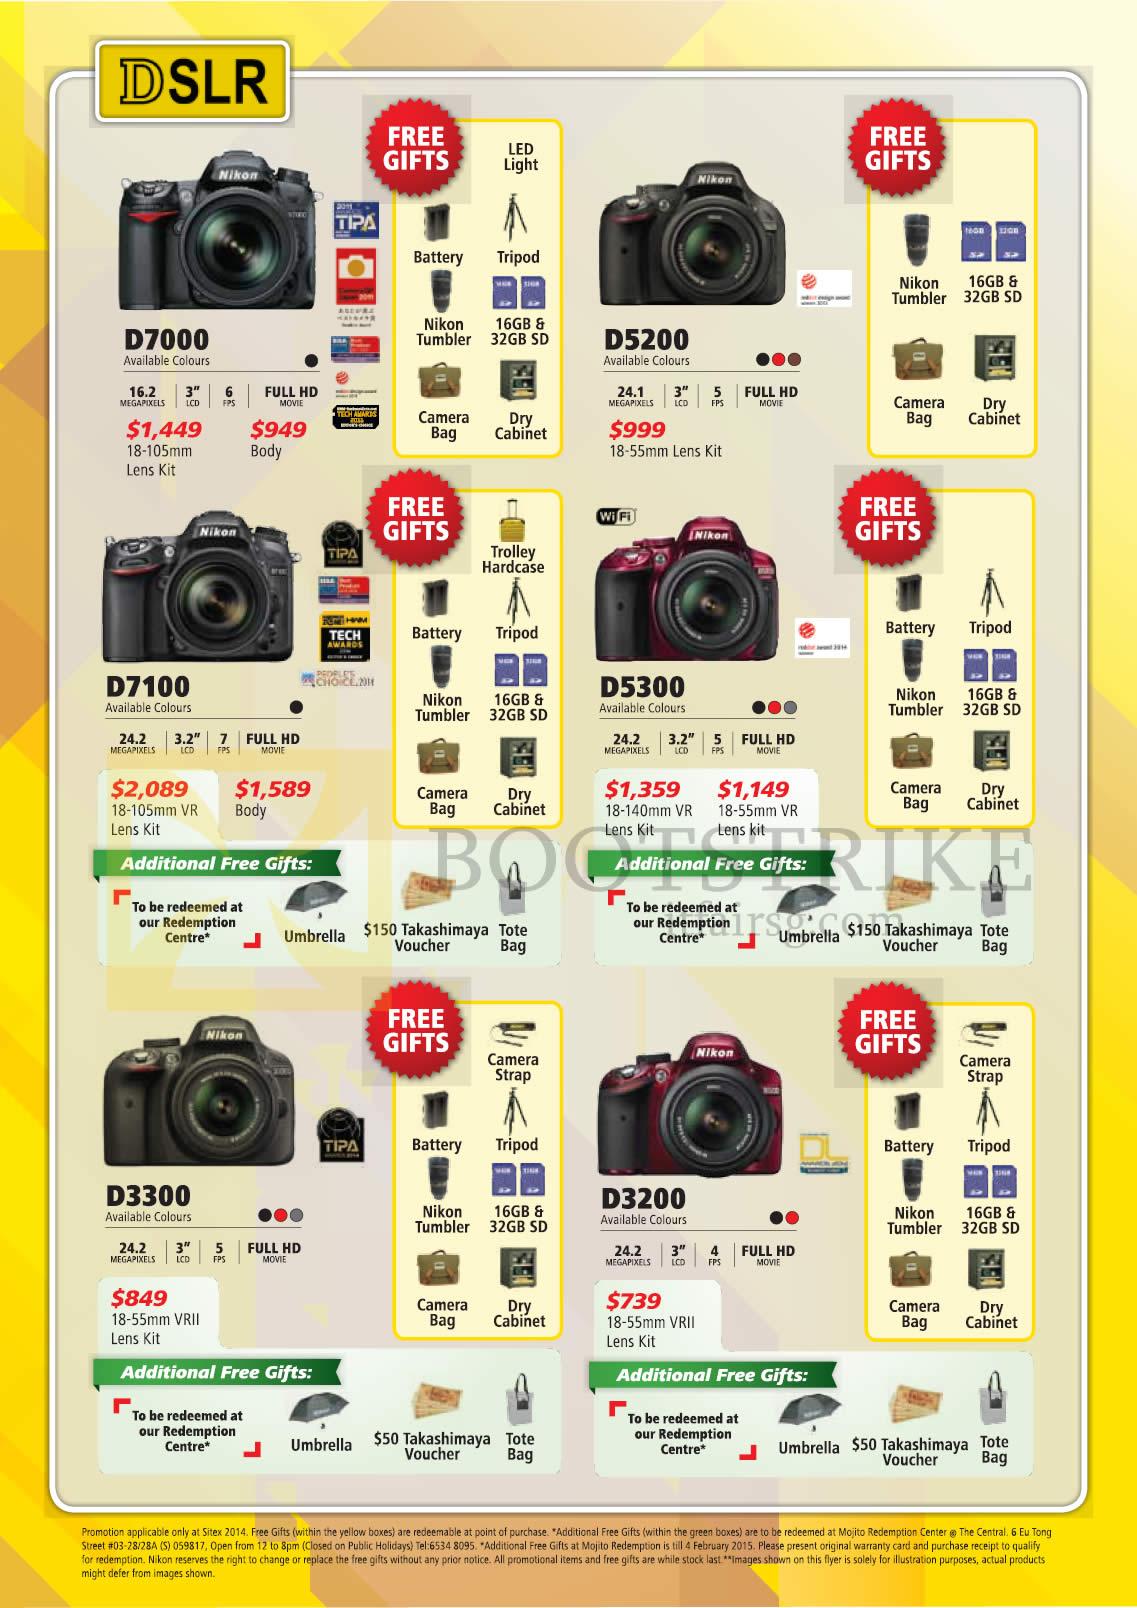 Camera List Of All Nikon Dslr Cameras nikon camera deal in town prices singapore d750 dslr digital cameras d7000 d5200 d7100 d5300 d3300